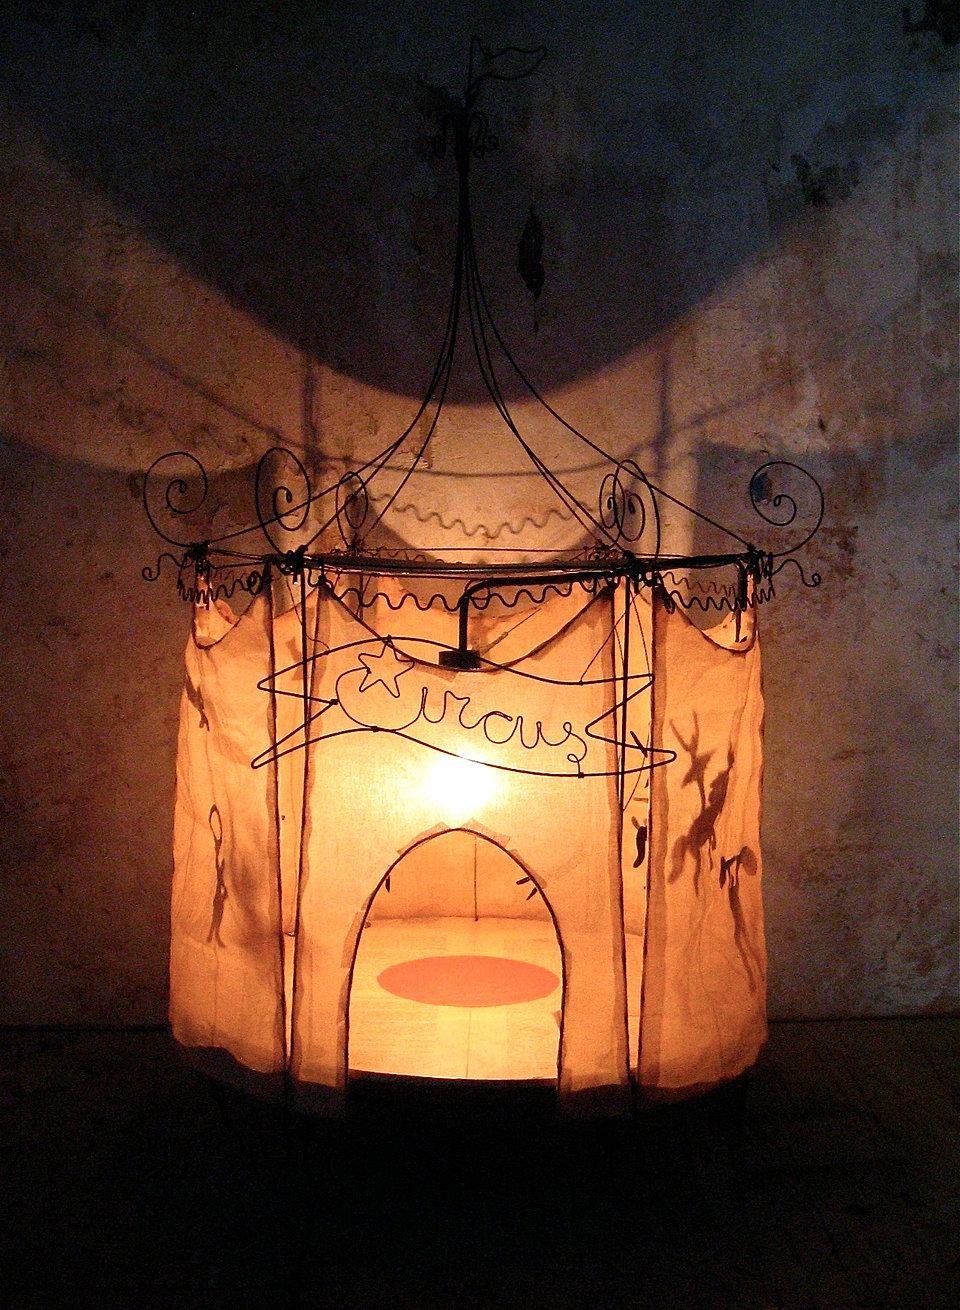 vox populi d coration am nagement d 39 int rieur lampes. Black Bedroom Furniture Sets. Home Design Ideas